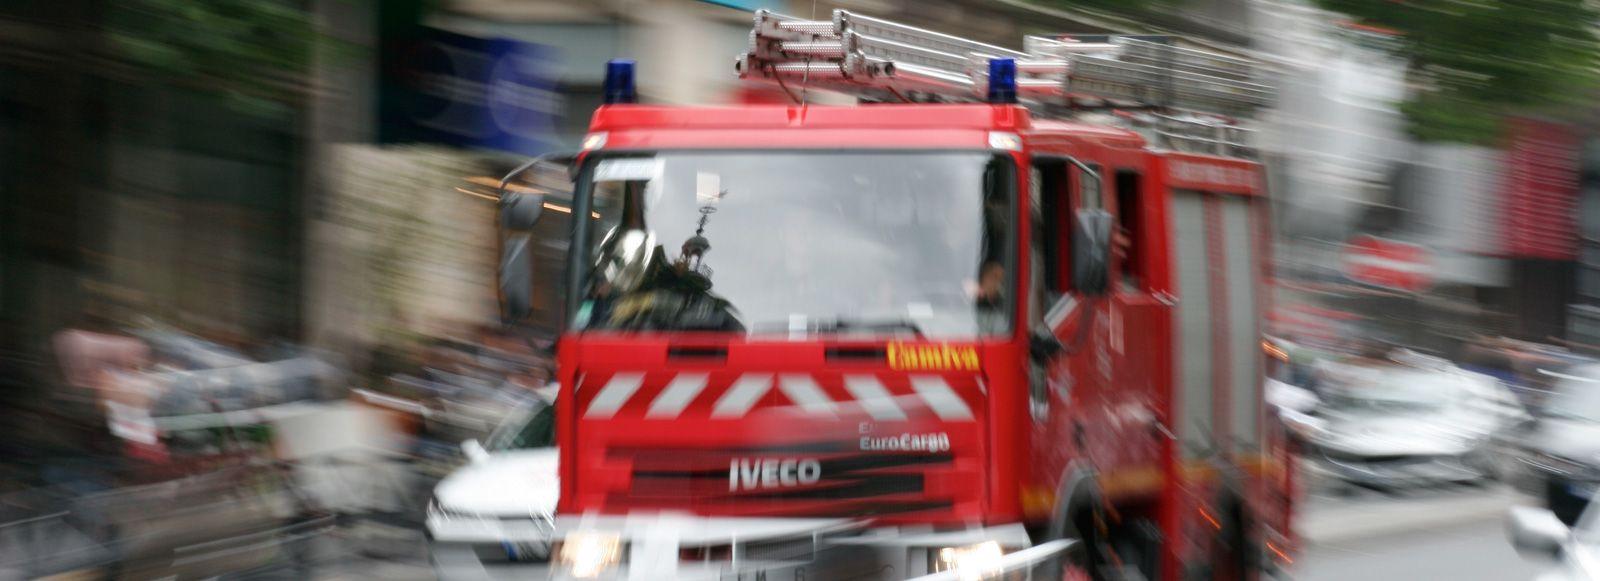 urgence-pompier